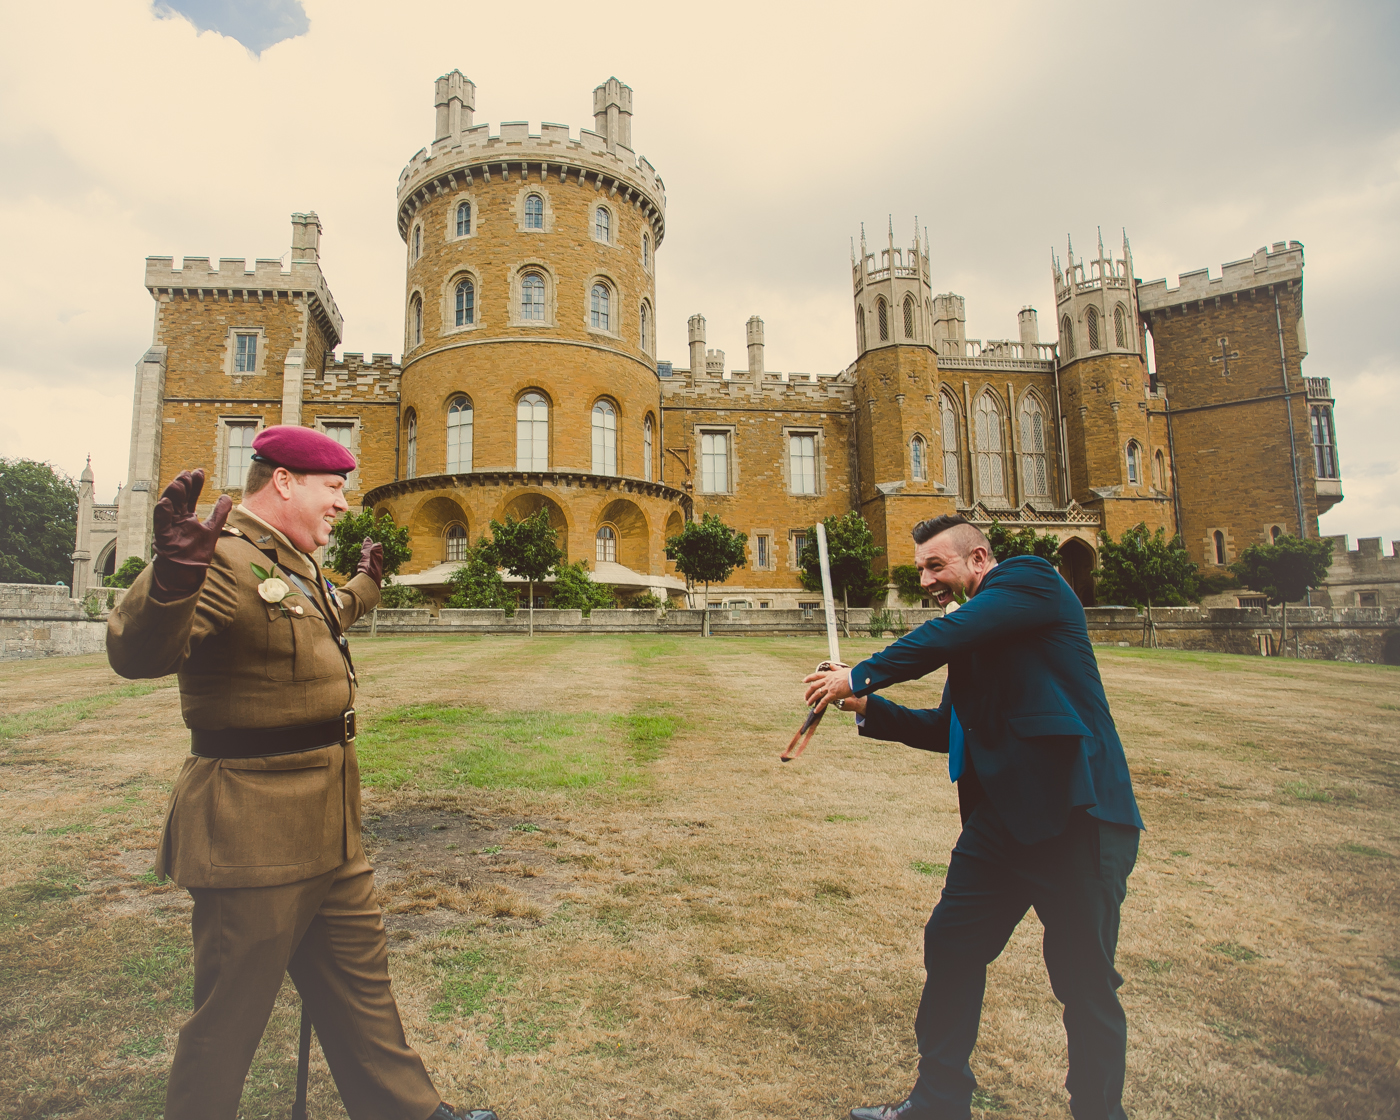 088 Donna and John Wedding Photography at Belvoir Castle www.belvoircastle.com UK by Mark Pugh.JPG